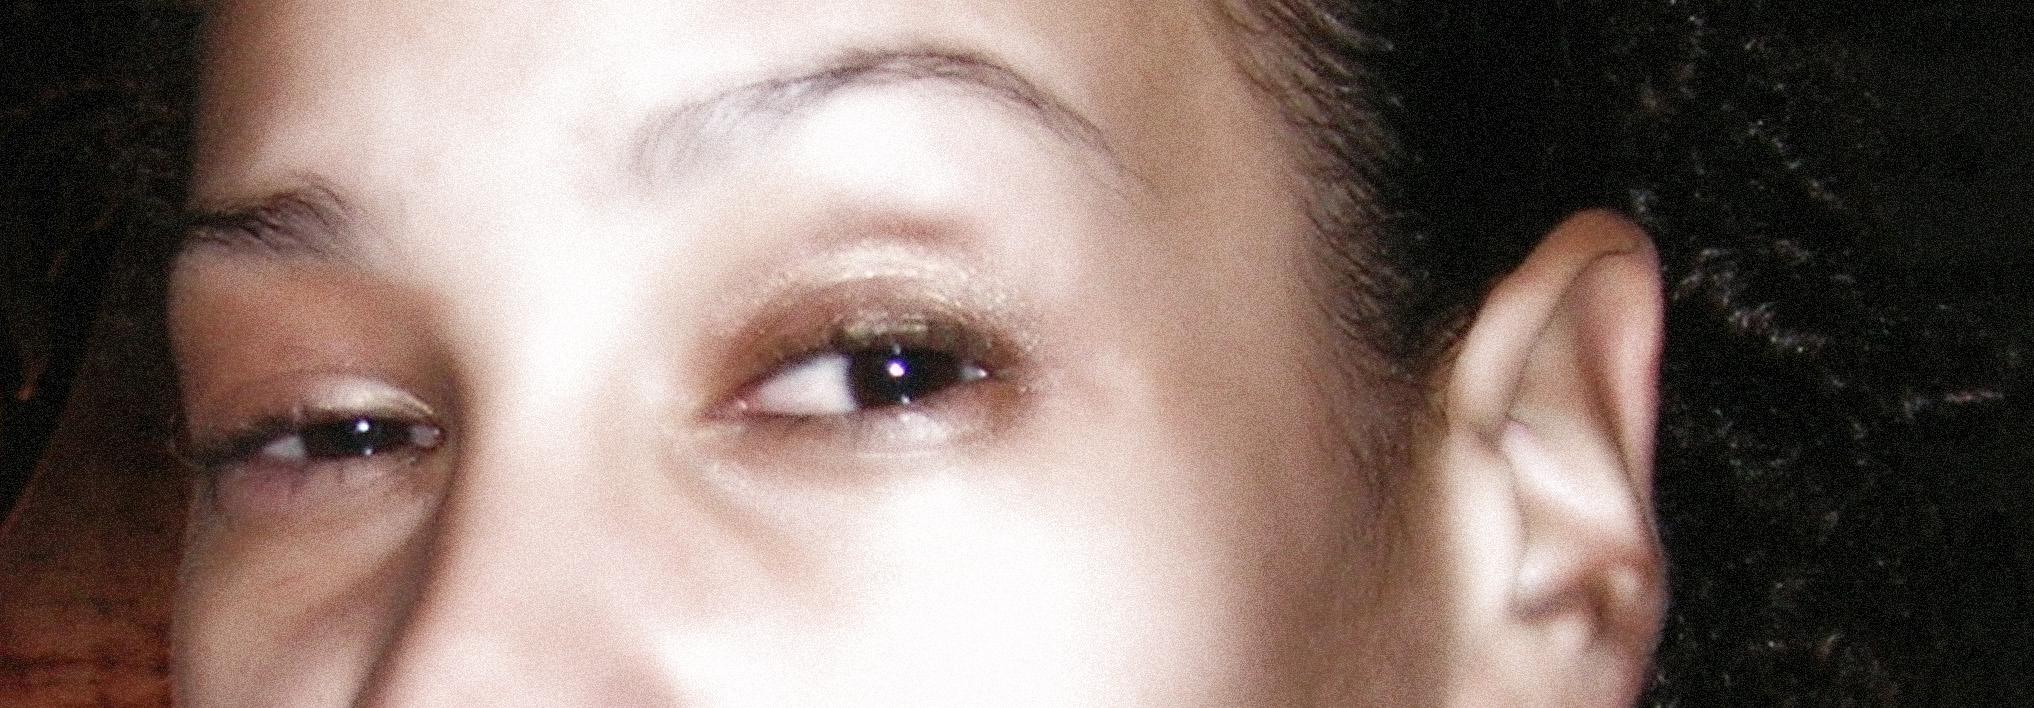 eyesglow.jpg